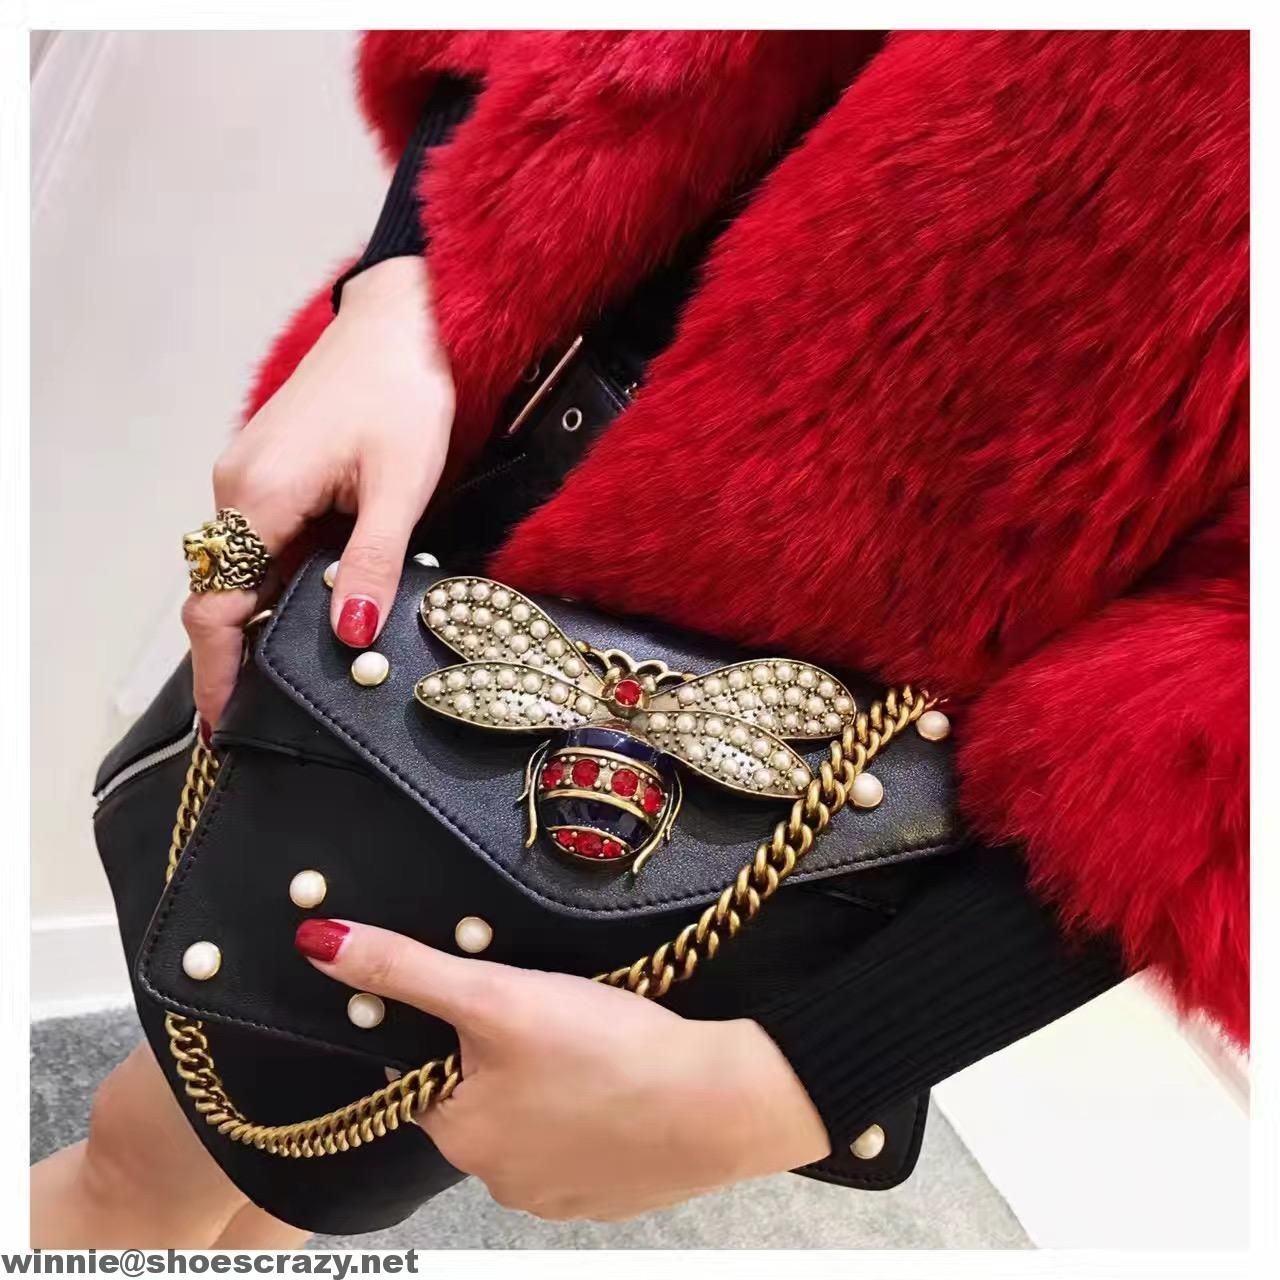 041a3558d96f Gucci Bee   Pearl Embellished Leather Shoulder Bag 2017